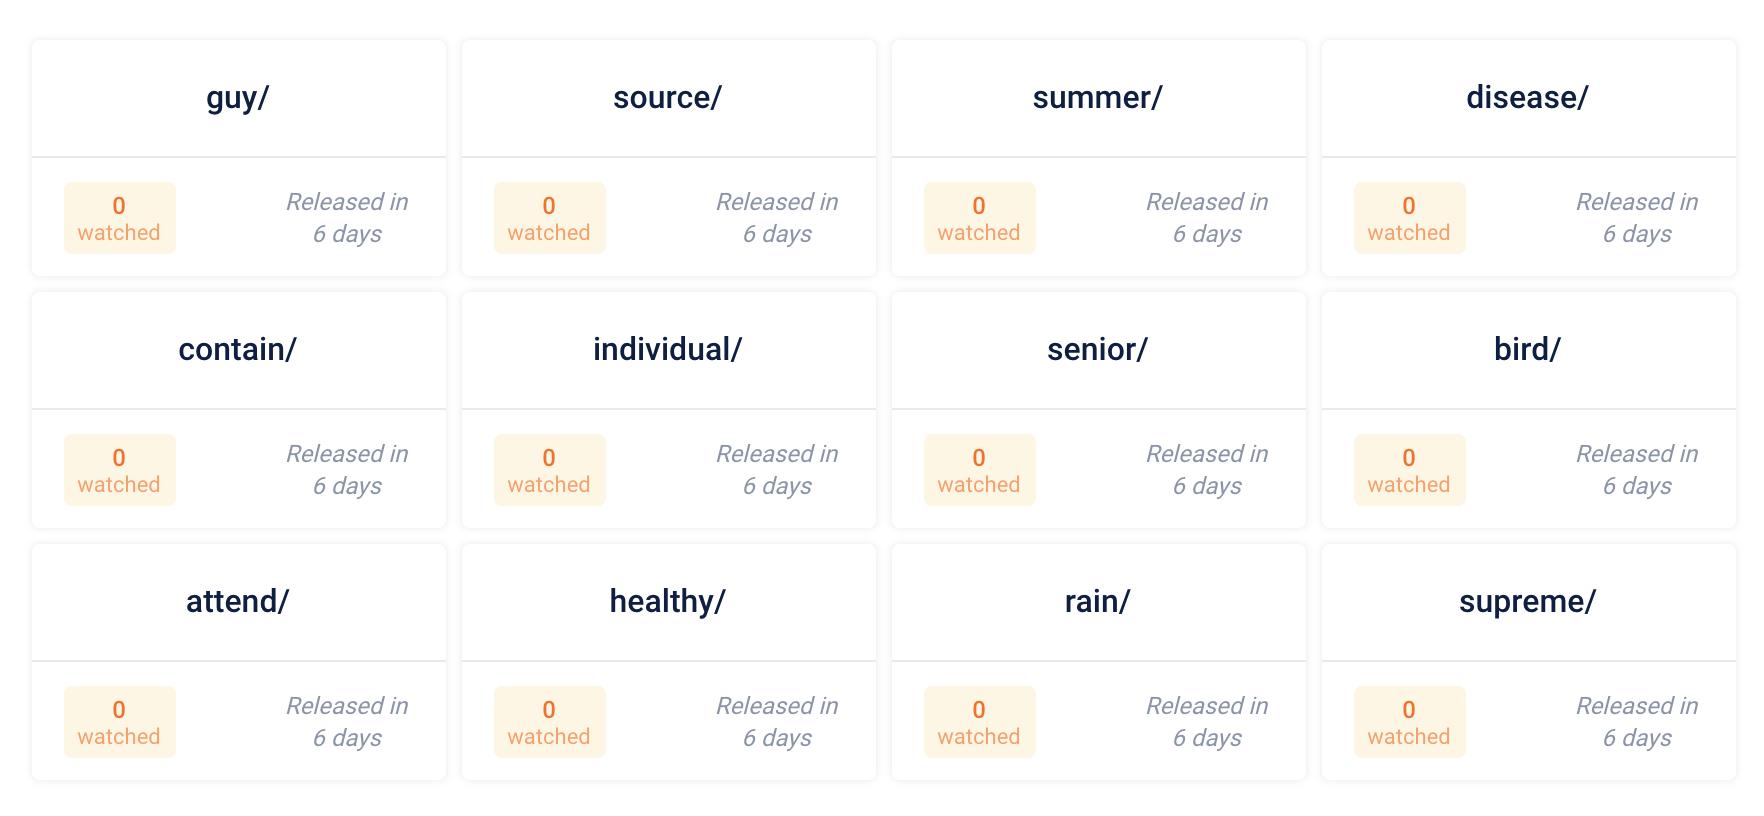 "La era de Dotcom Crypto comienza cuando un apretón de manos lanza dominios descentralizados"" width = ""1764"" height = ""816"" srcset = ""https://news.bitcoin.com/wp-content/uploads/2020/02/ screenshot-2020-02-05-at-16-06-00.png 1764w, https: //news.bitcoin .com / wp-content / uploads / 2020/02 / screenshot-2020-02-05-at-16 -06-00-300x139.png 300w, https://news.bitcoin.com/wp-content/uploads/ 2020/02 / screenshot-2020-02-05-at-16-06-00-1024x474.png 1024w , https://news.bitcoin.com/wp-content/uploads/2020/02/screenshot-2020-02 -05-at-16-06-00-768x355.png 768w, https: //news.bitcoin. com / wp-content / uploads / 2020/02 / screenshot-2020-02-05-at-16-06- 00-1536x711.png 1536w, https://news.bitcoin.com/wp-content/uploads/2020 /02/screenshot-2020-02-05-at-16-06-00-696x322.png 696w, https: //news.bitcoin.com/wp-content/uploads/2020/02/screenshot-2020-02- 05-at-16-06-00-1392x644.png 1392w, https://news.bitcoin.co m / wp-content / uploads / 2020/02 / screenshot-2020-02-05-at-16-06- 00-1068x494.png 106 8w, https://news.bitcoin.com/wp-content/uploads/2020 /02/screenshot-2020-02-05-at-16-06-00-908x420.png 908w ""tamaños ="" (ancho máximo: 1764px) 100vw, 1764px"